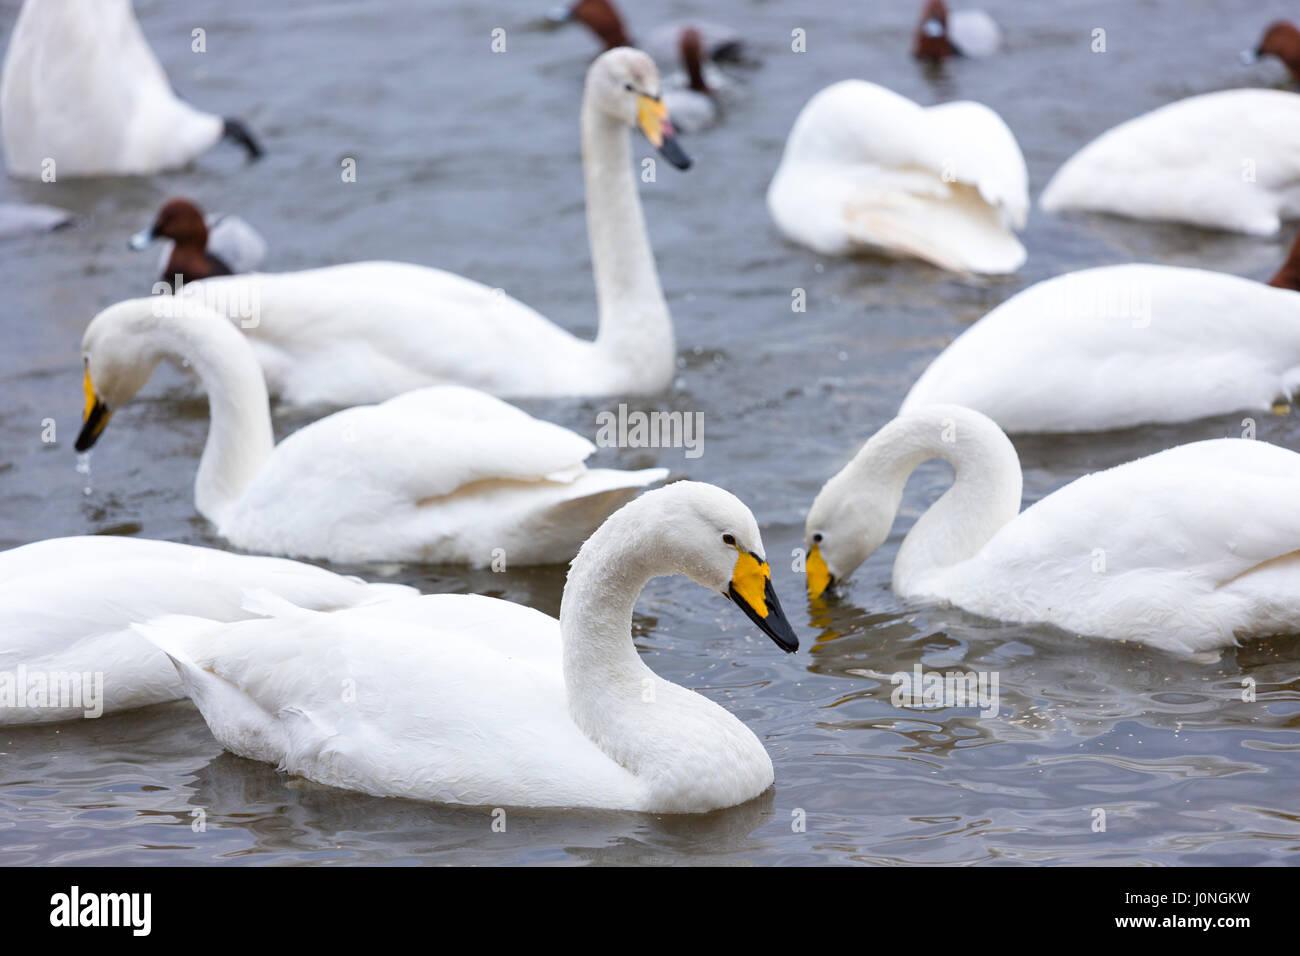 Group of Whooper Swan, Cygnus cygnus, at Welney Wetland Centre, Norfolk, UK Stock Photo